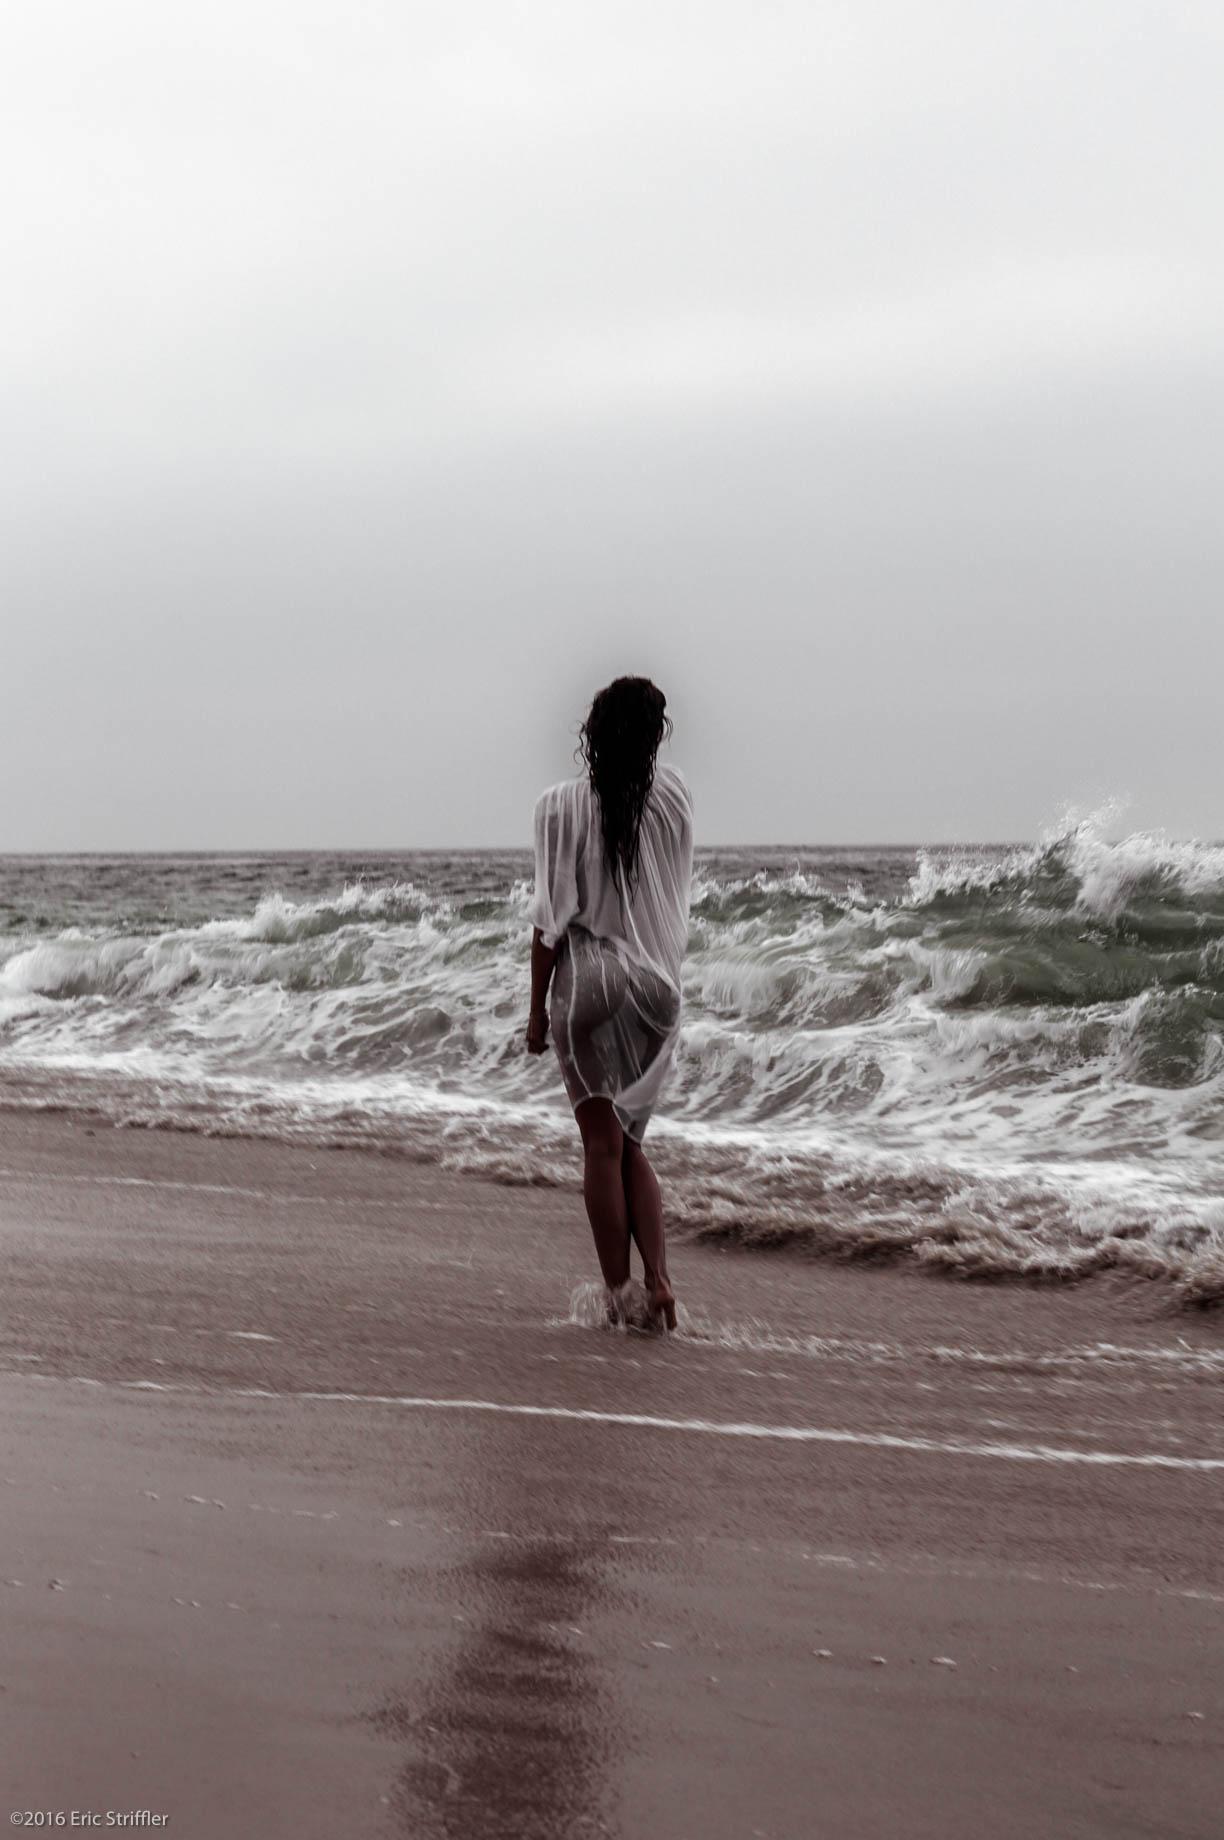 eric_striffler_photography_travel-194.jpg